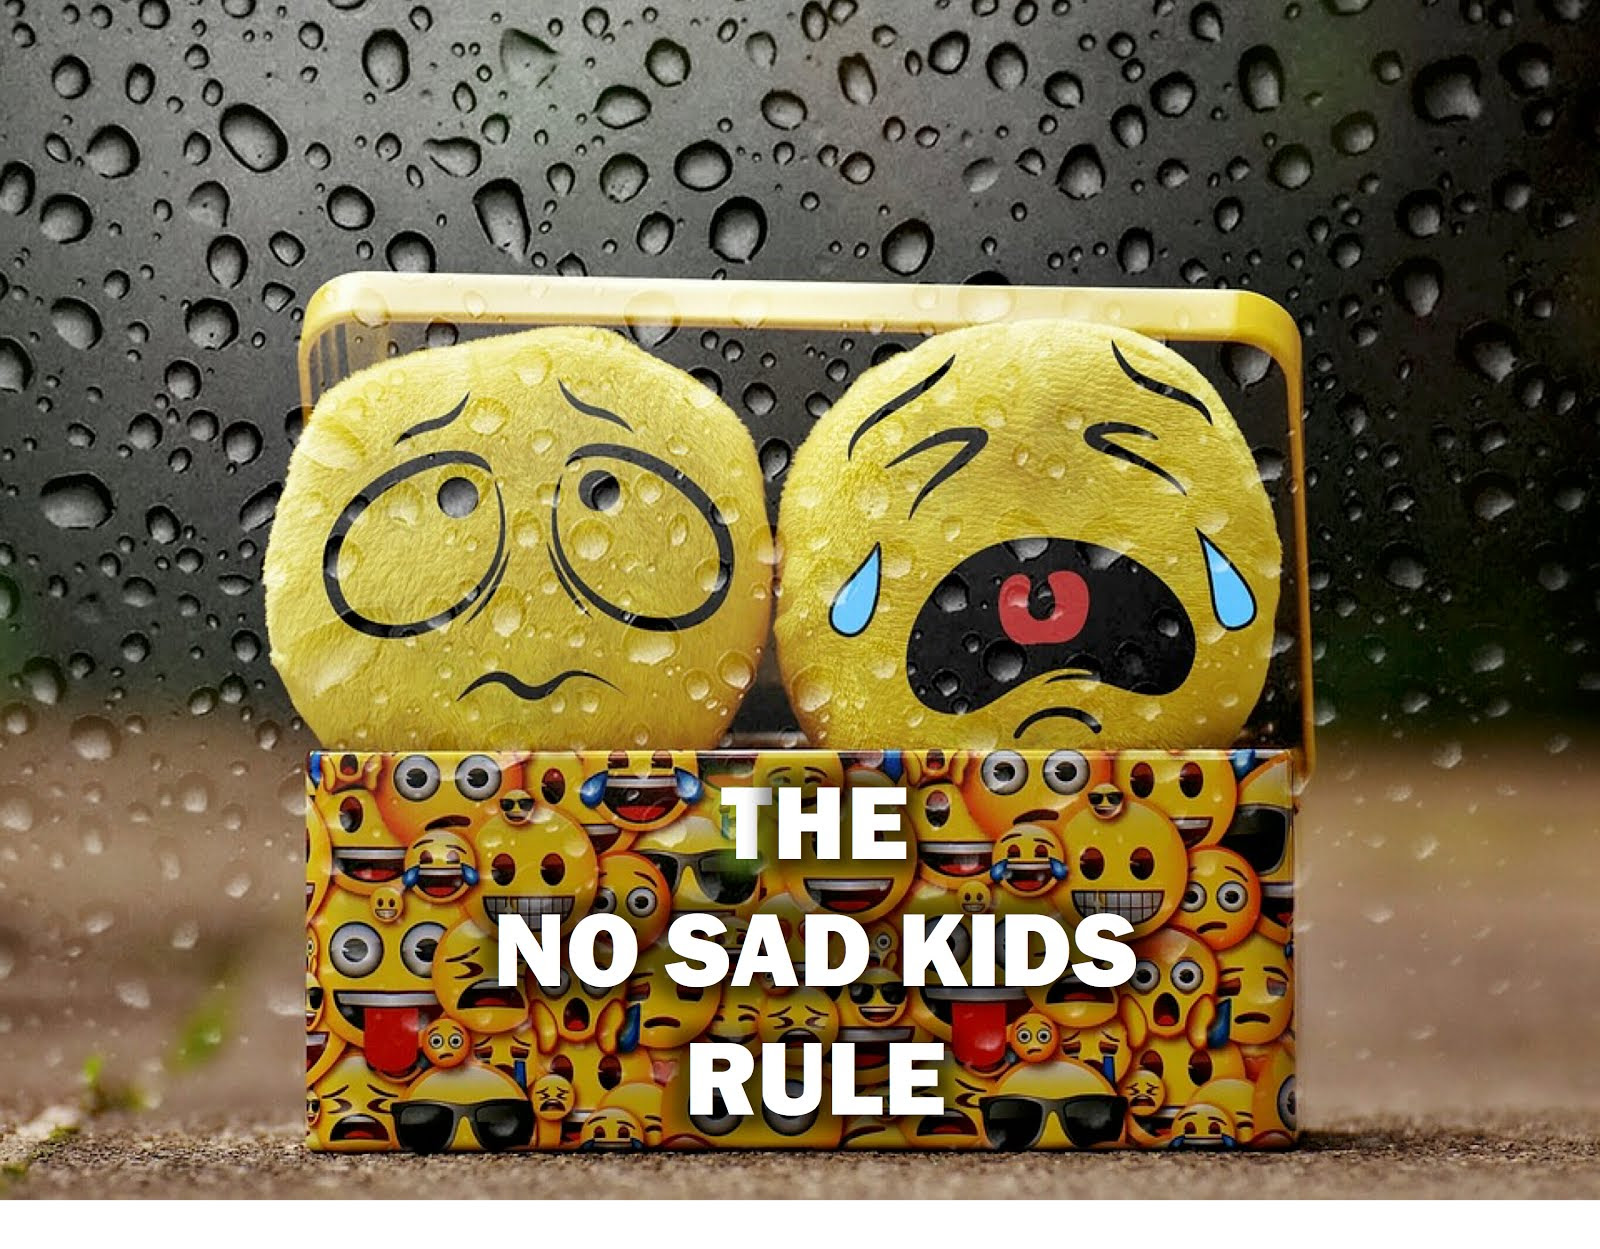 The No Sad Kid Rule